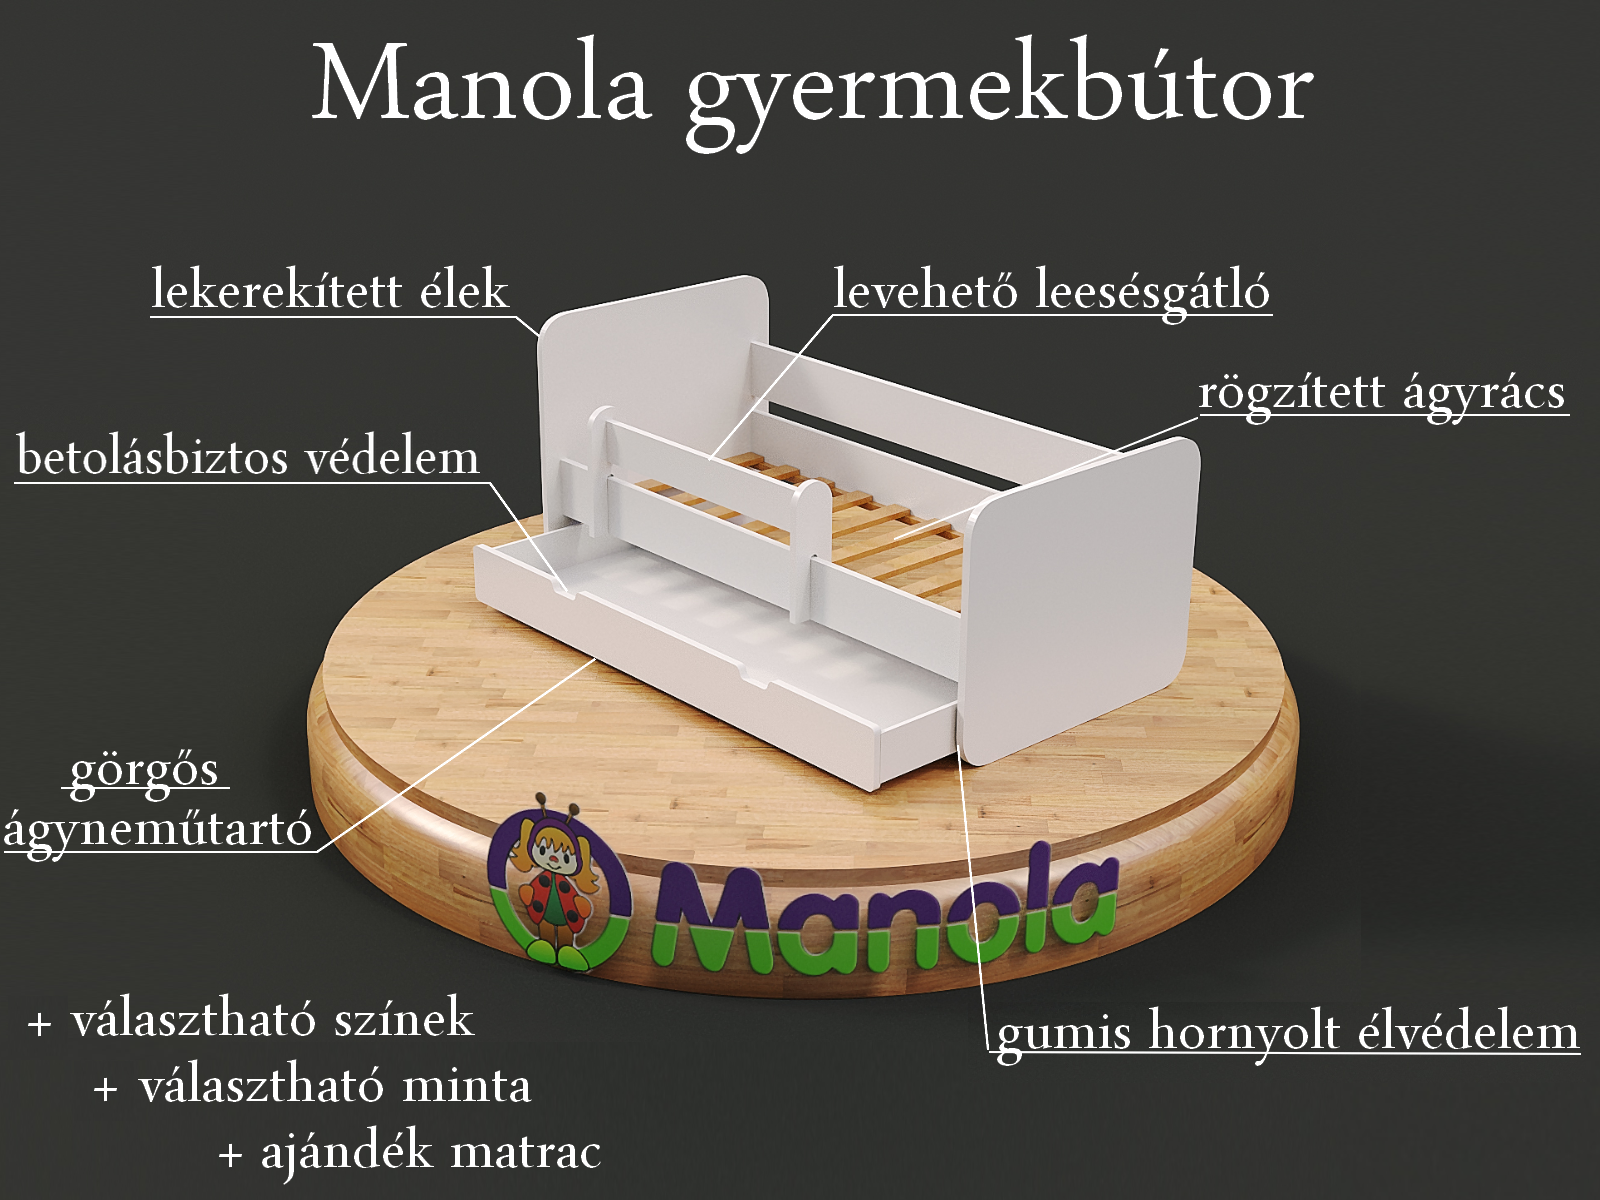 manola-biztonsagos-gyerekagy-alicia-hu.p